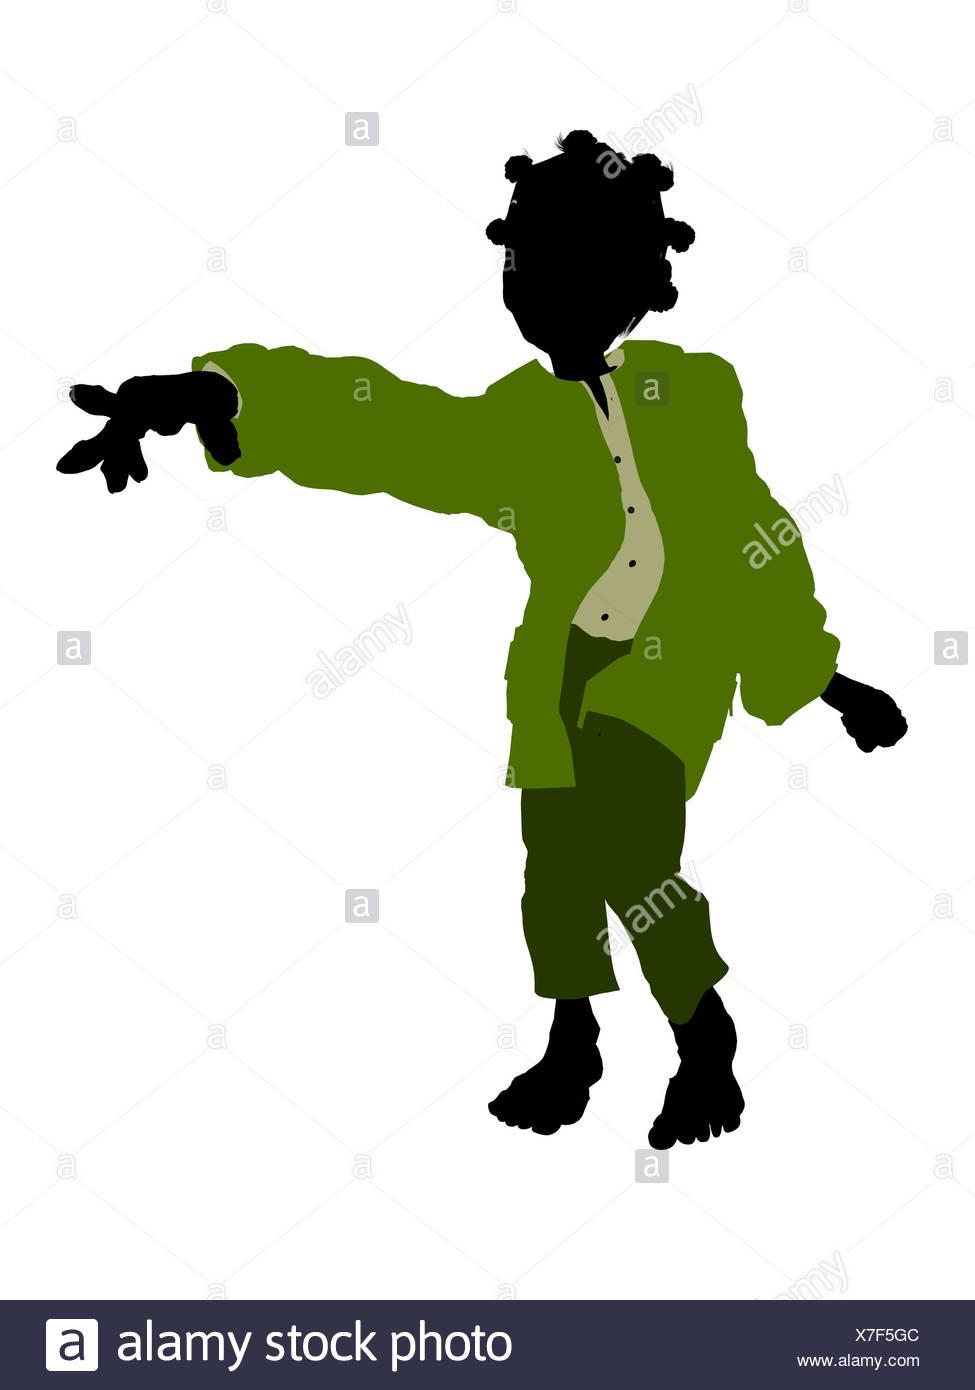 975x1390 Dwarf Silhouette Illustration Stock Photo 280002140